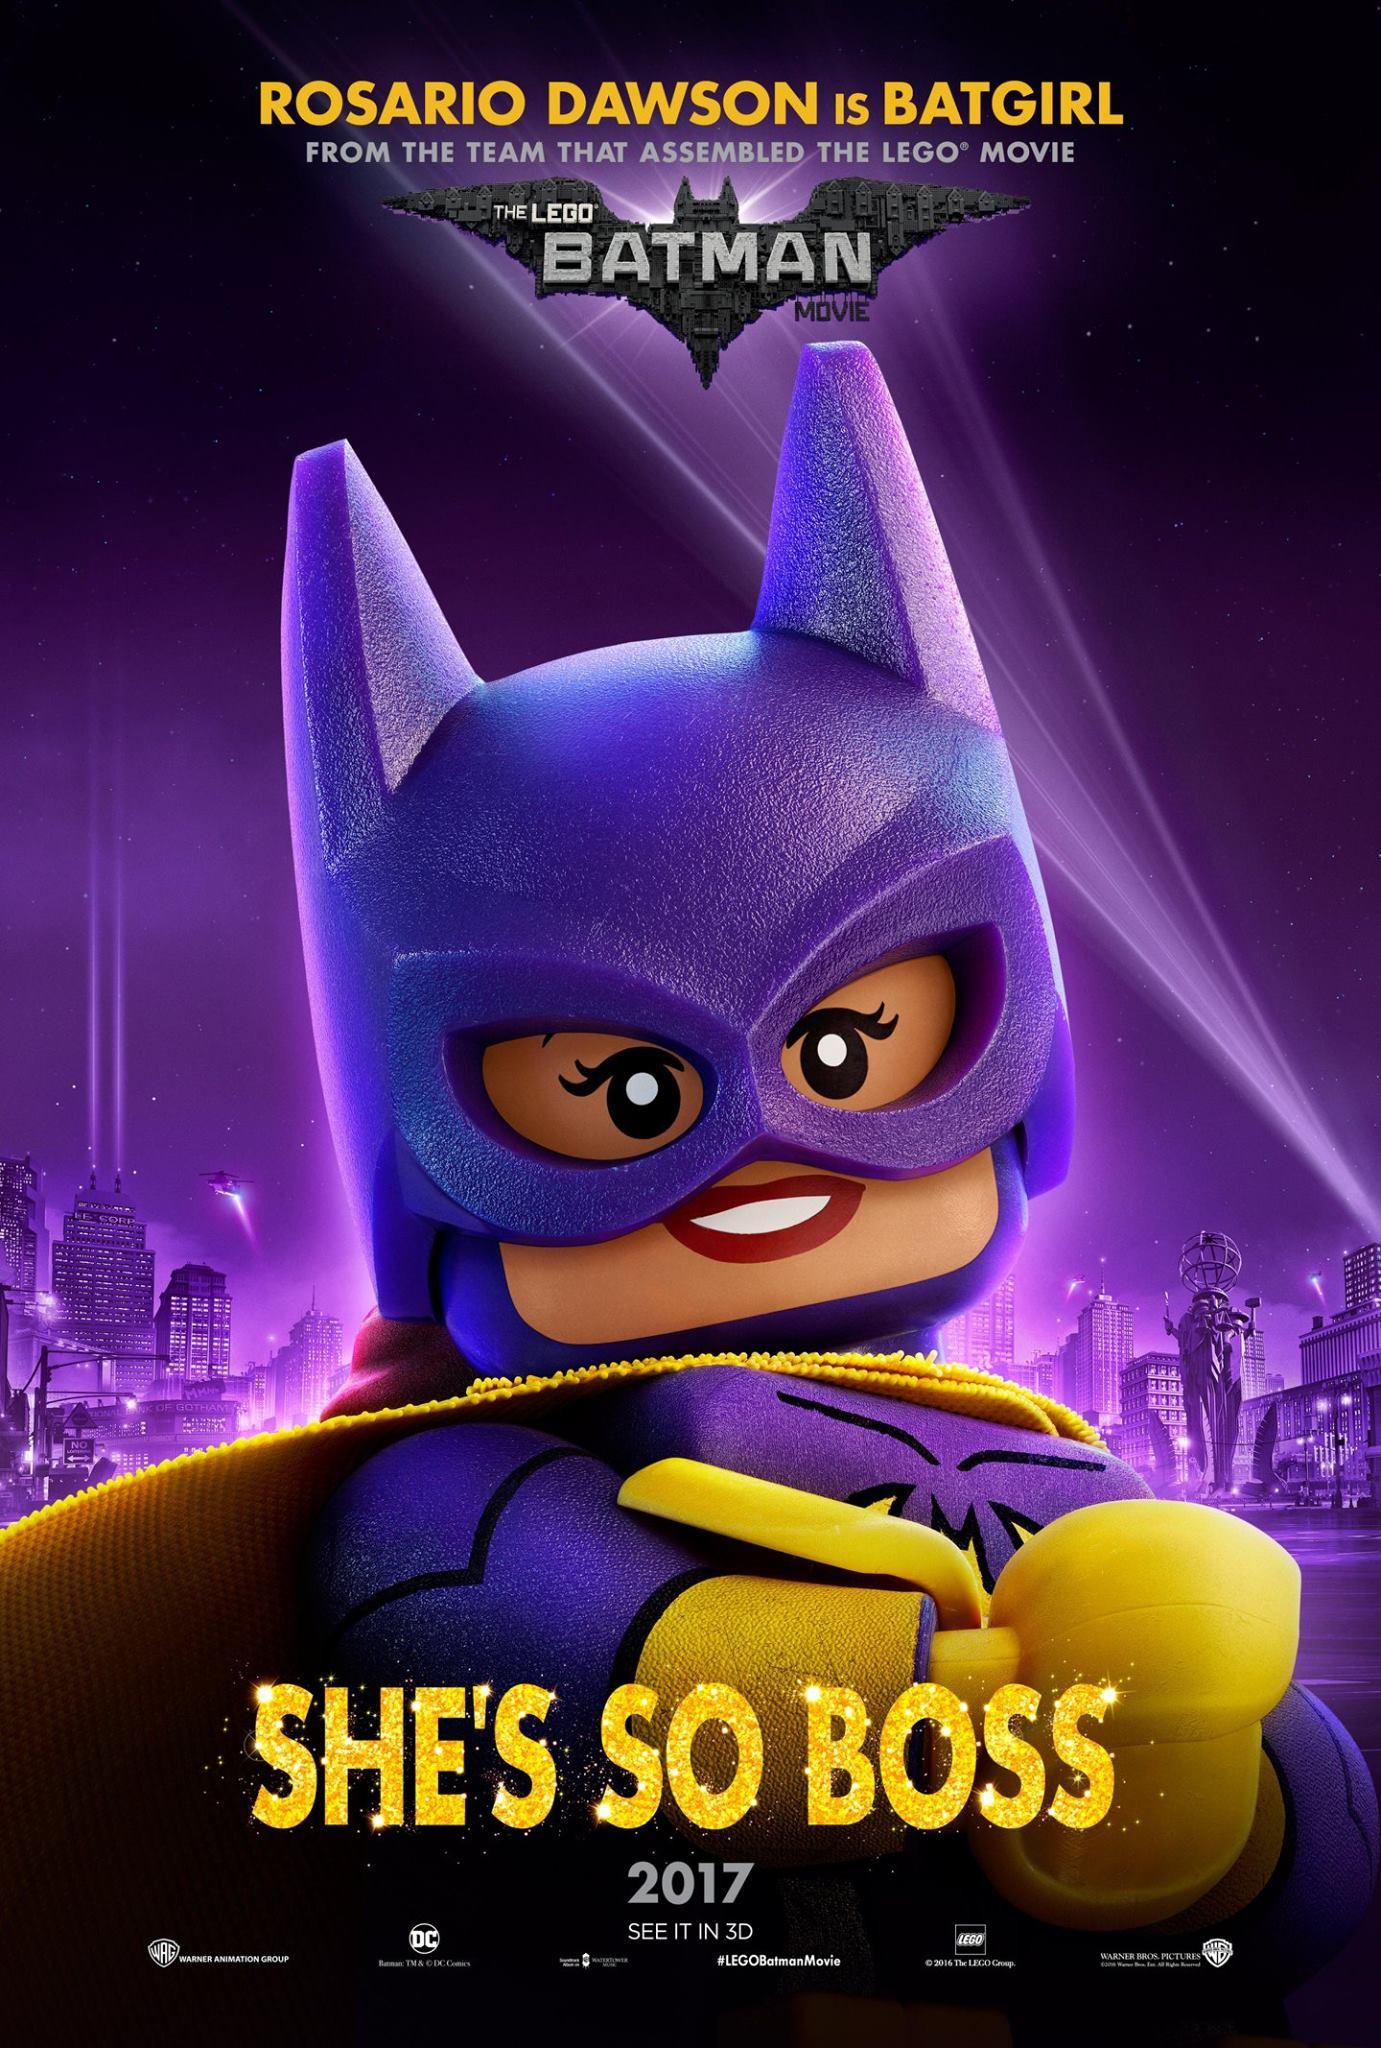 lego_batman_movie_p10.png